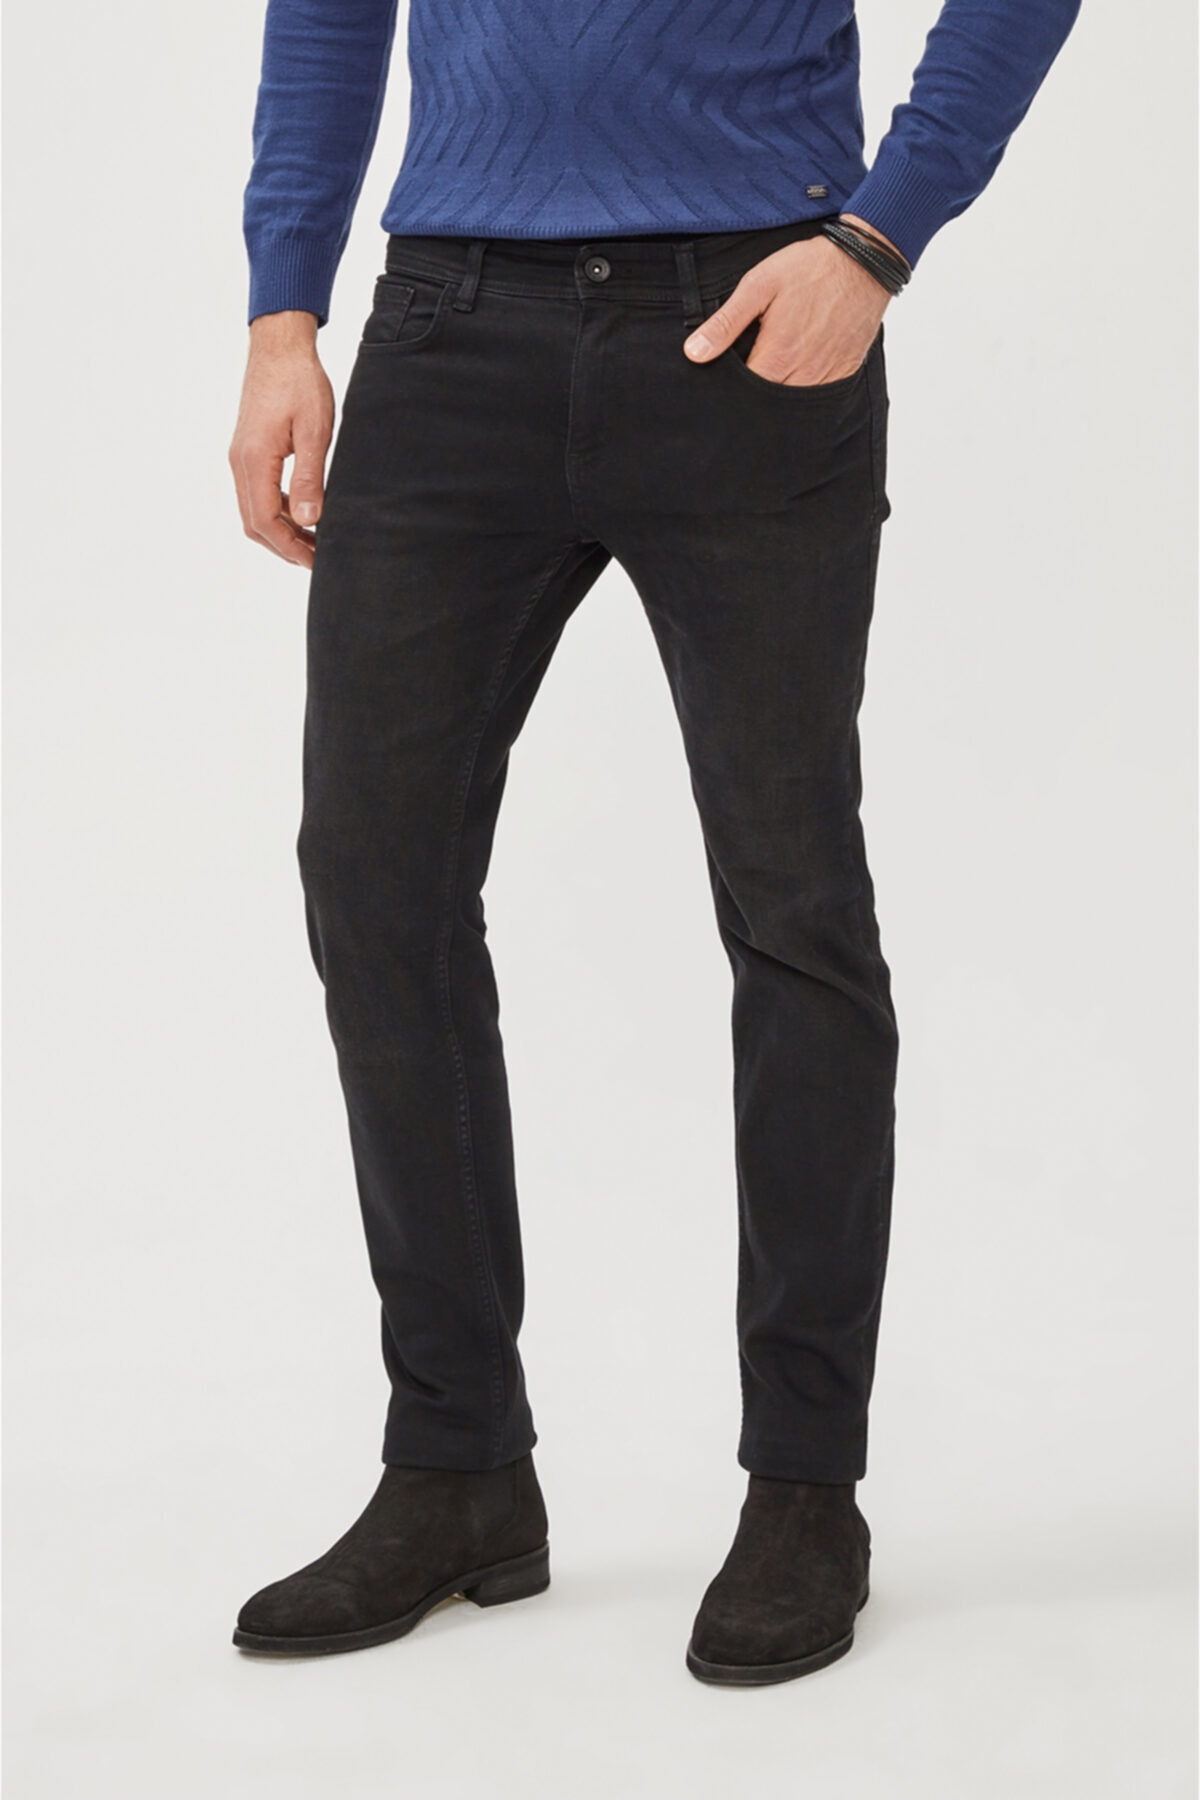 Avva Erkek Siyah Slim Fit Jean Pantolon E003512 1